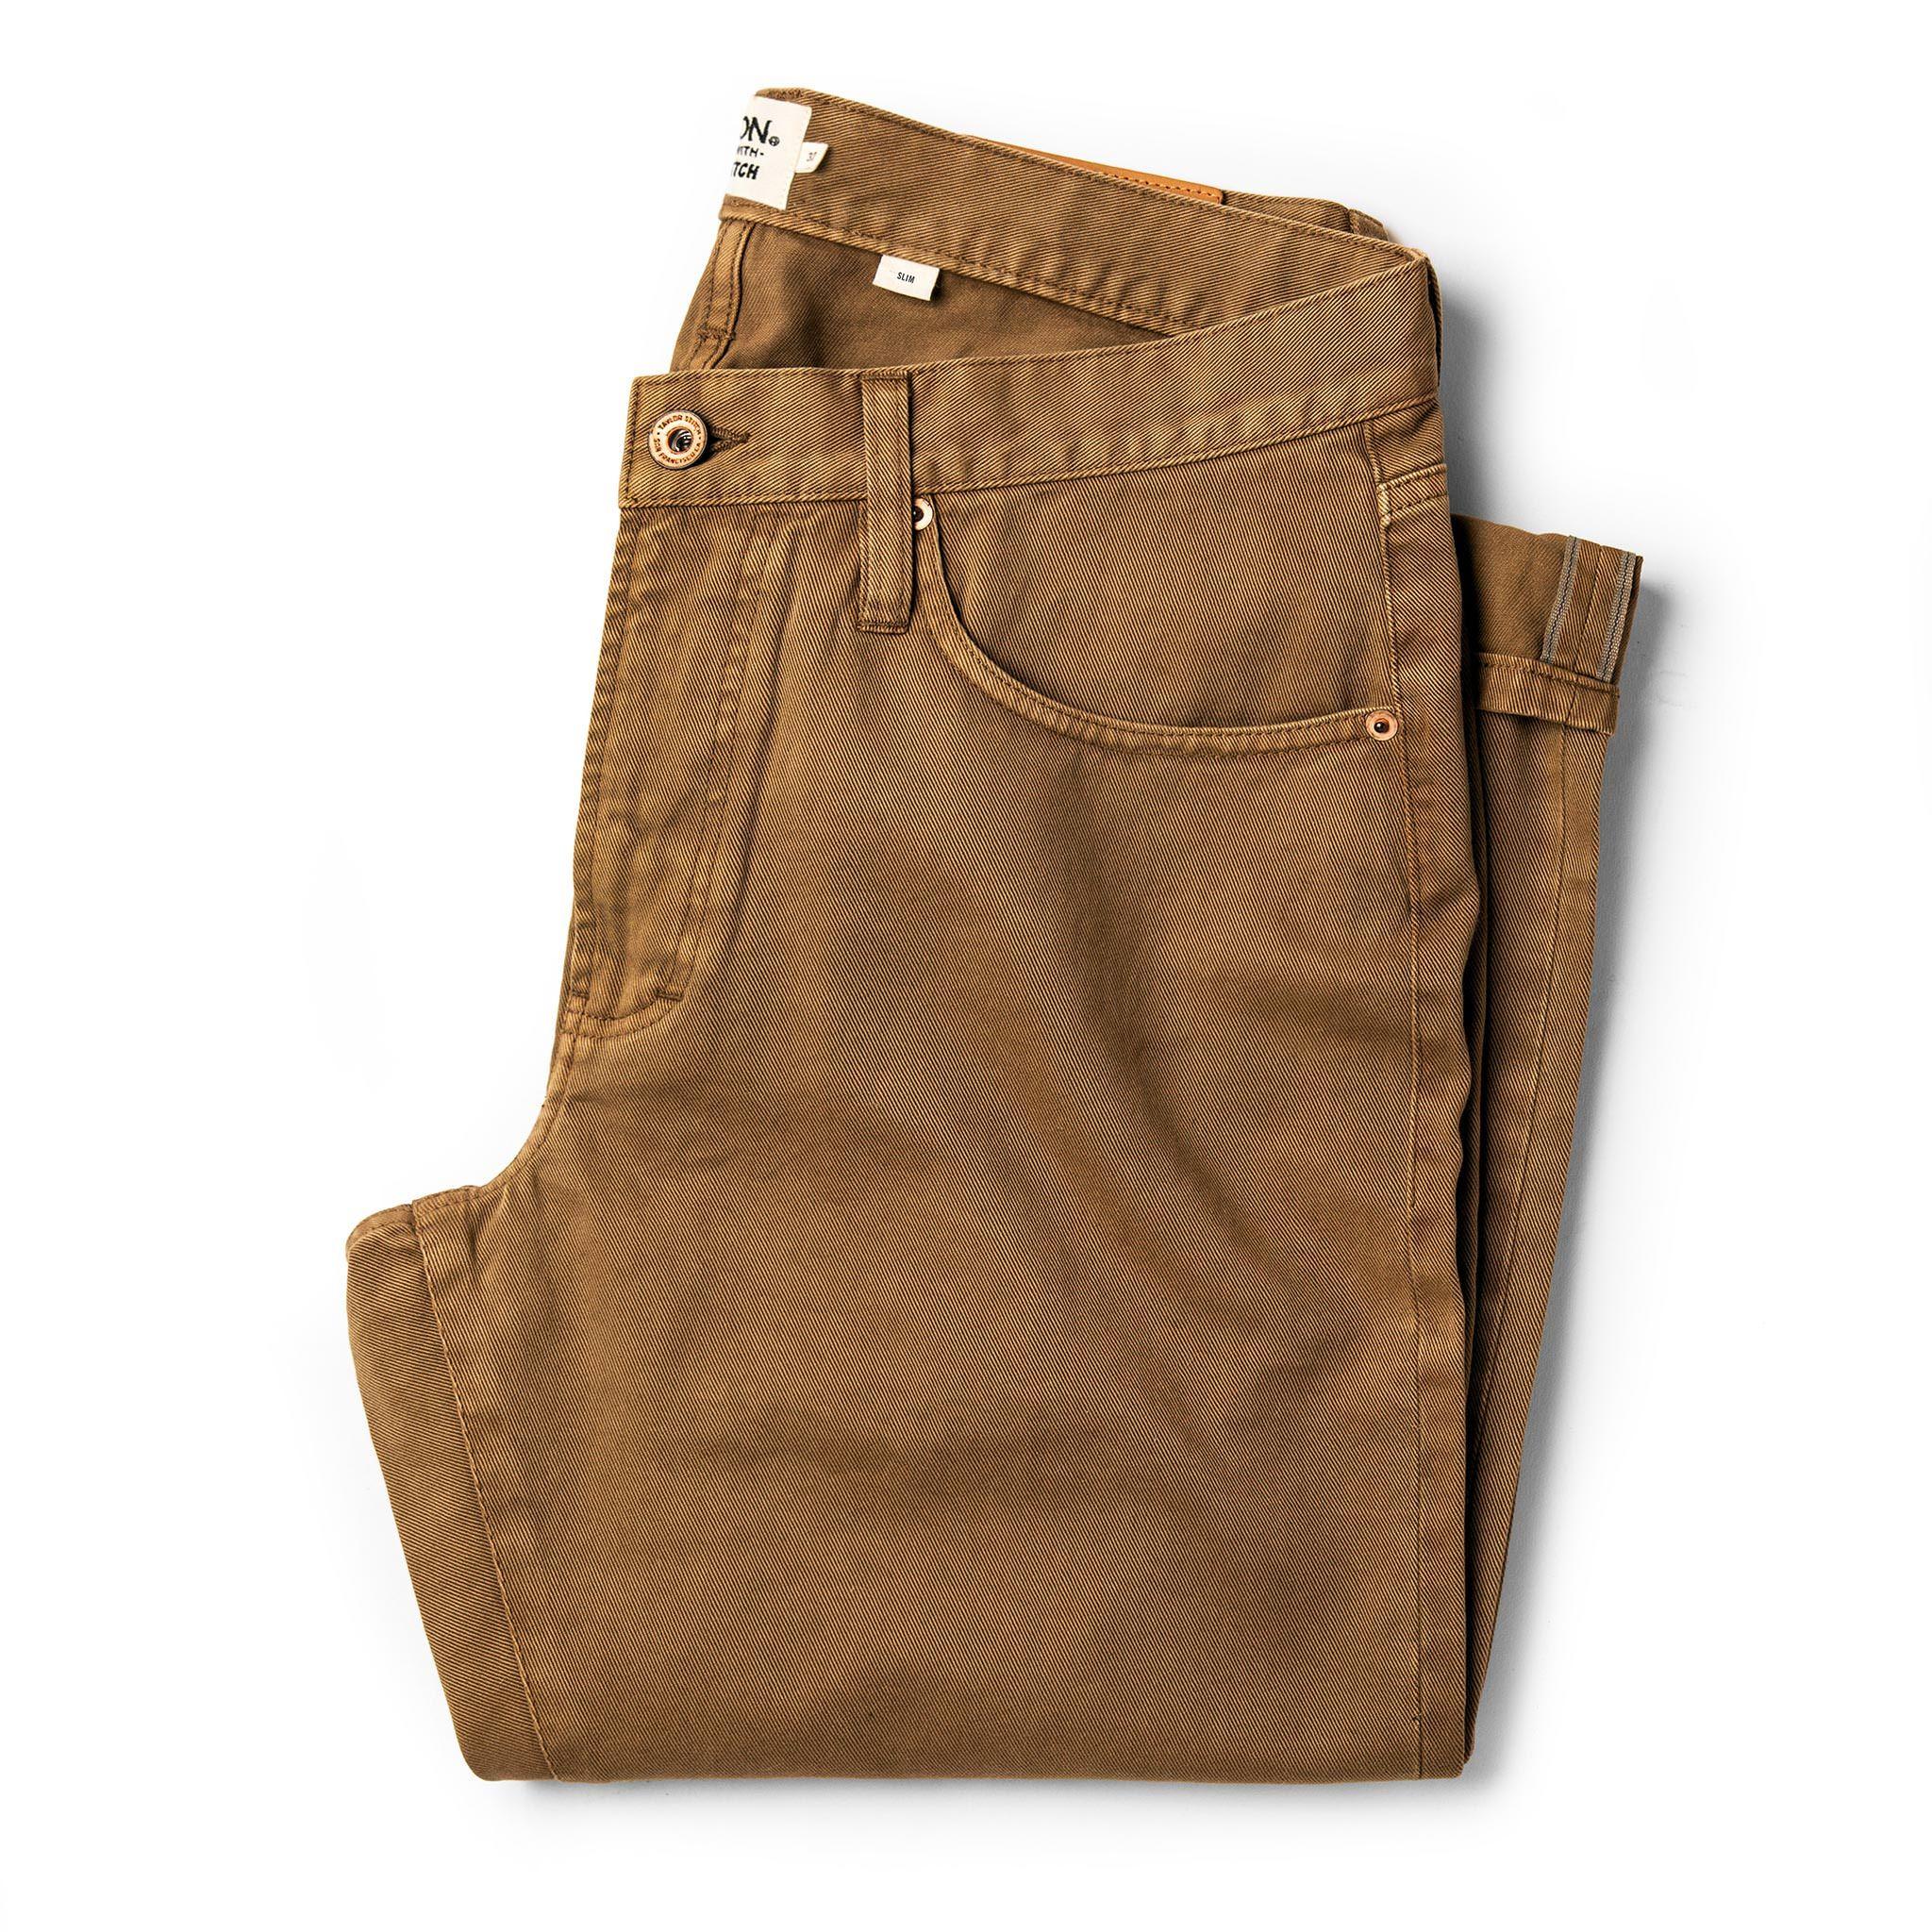 Taylor Stitch Slim All-Day Pants